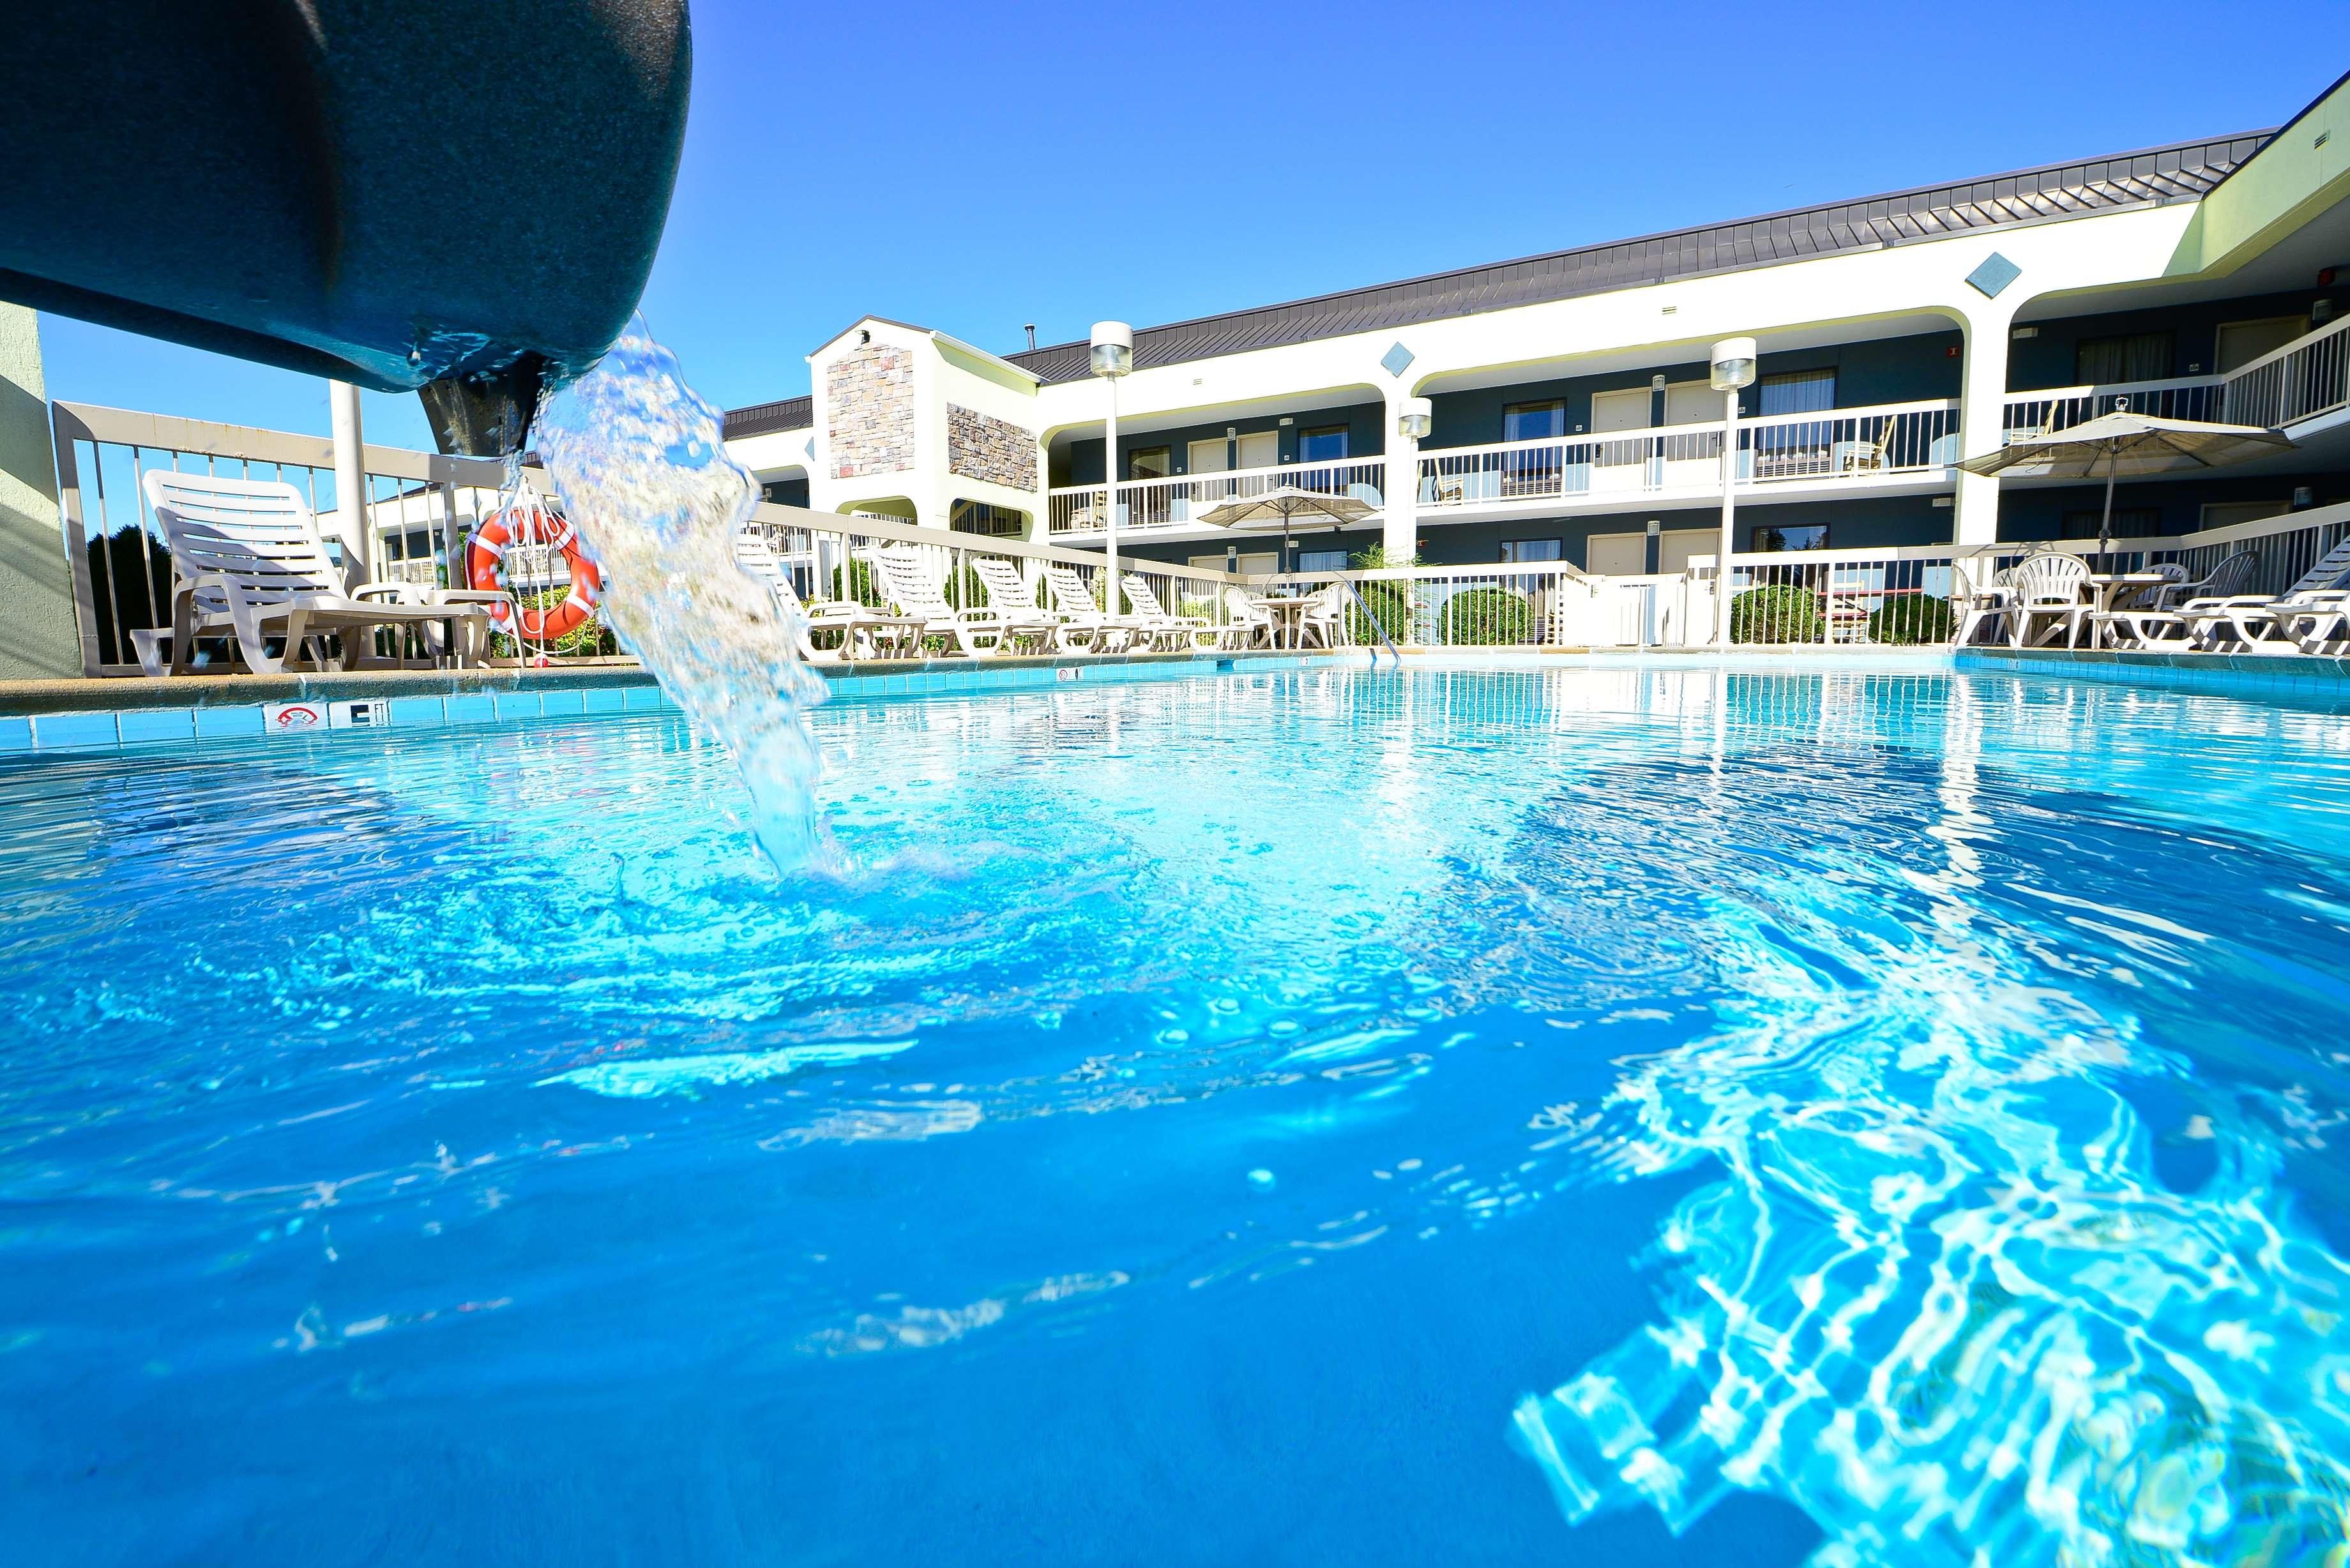 Best Western Cades Cove Inn image 15